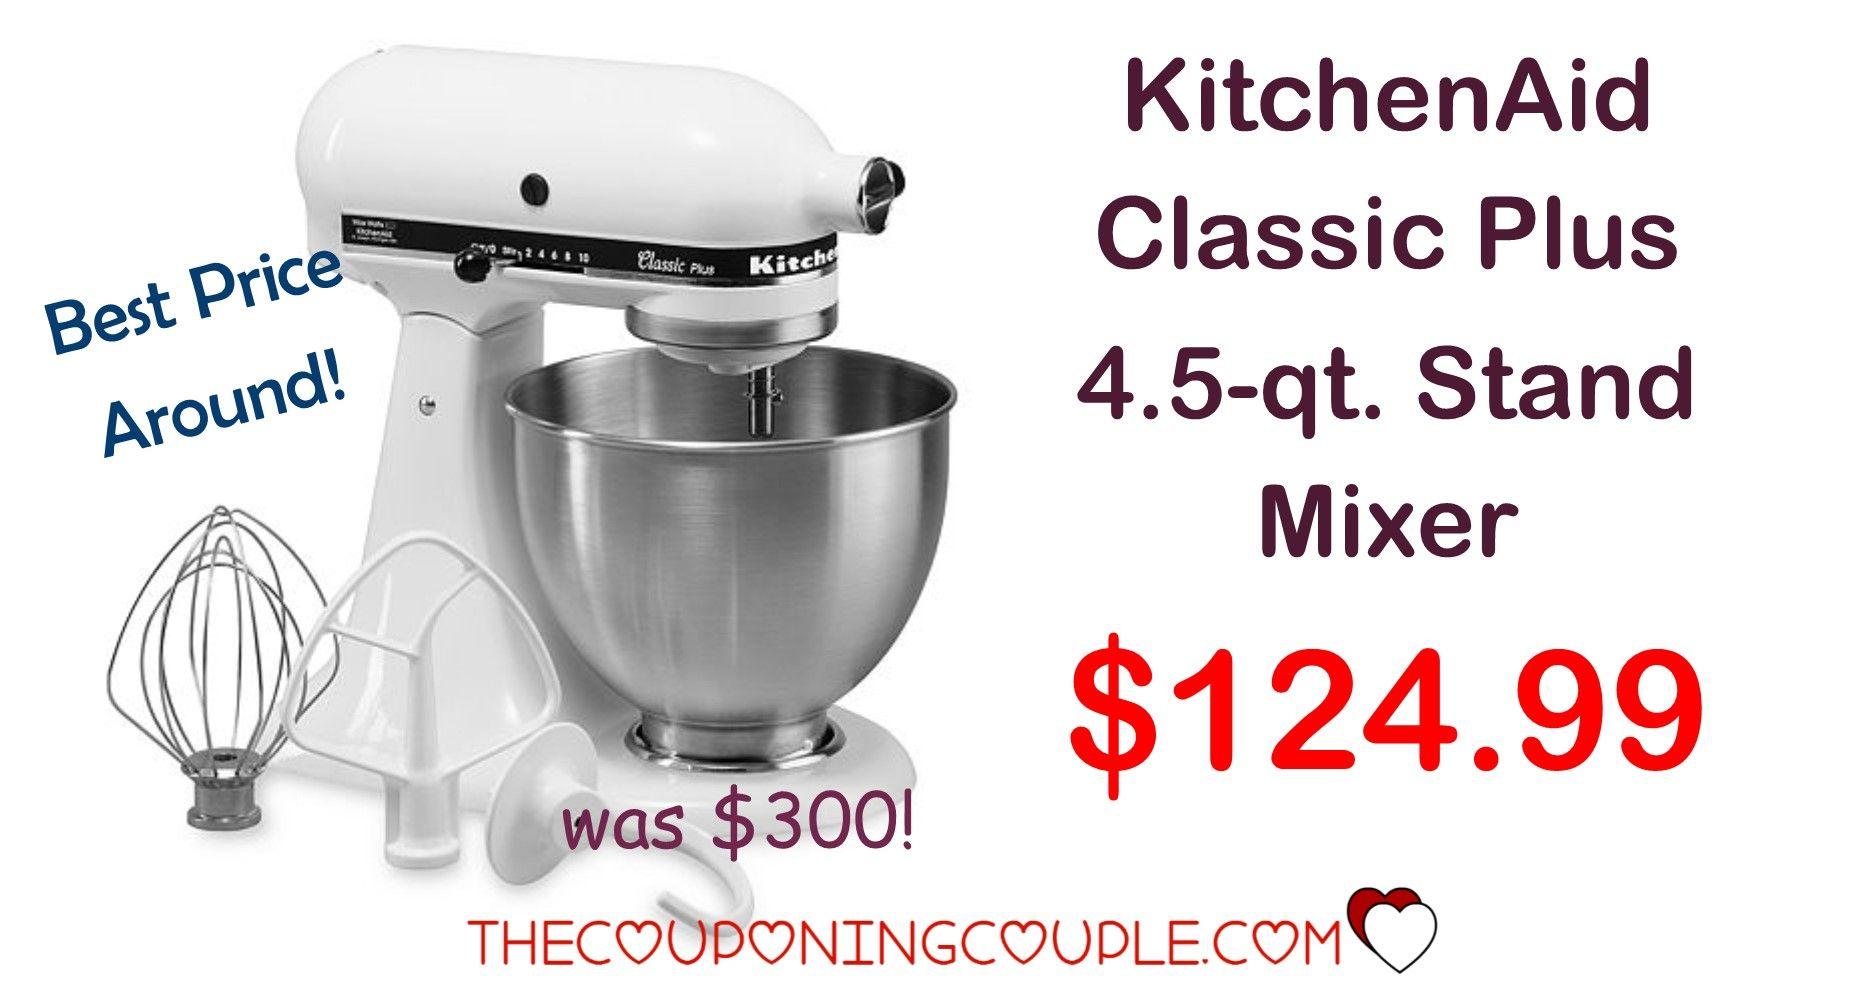 Inspiring Kitchenaid Ksmwh White Qt Countertop Mixer Of Classic Plus Stand  Trend And Inspiration Kitchenaid 4